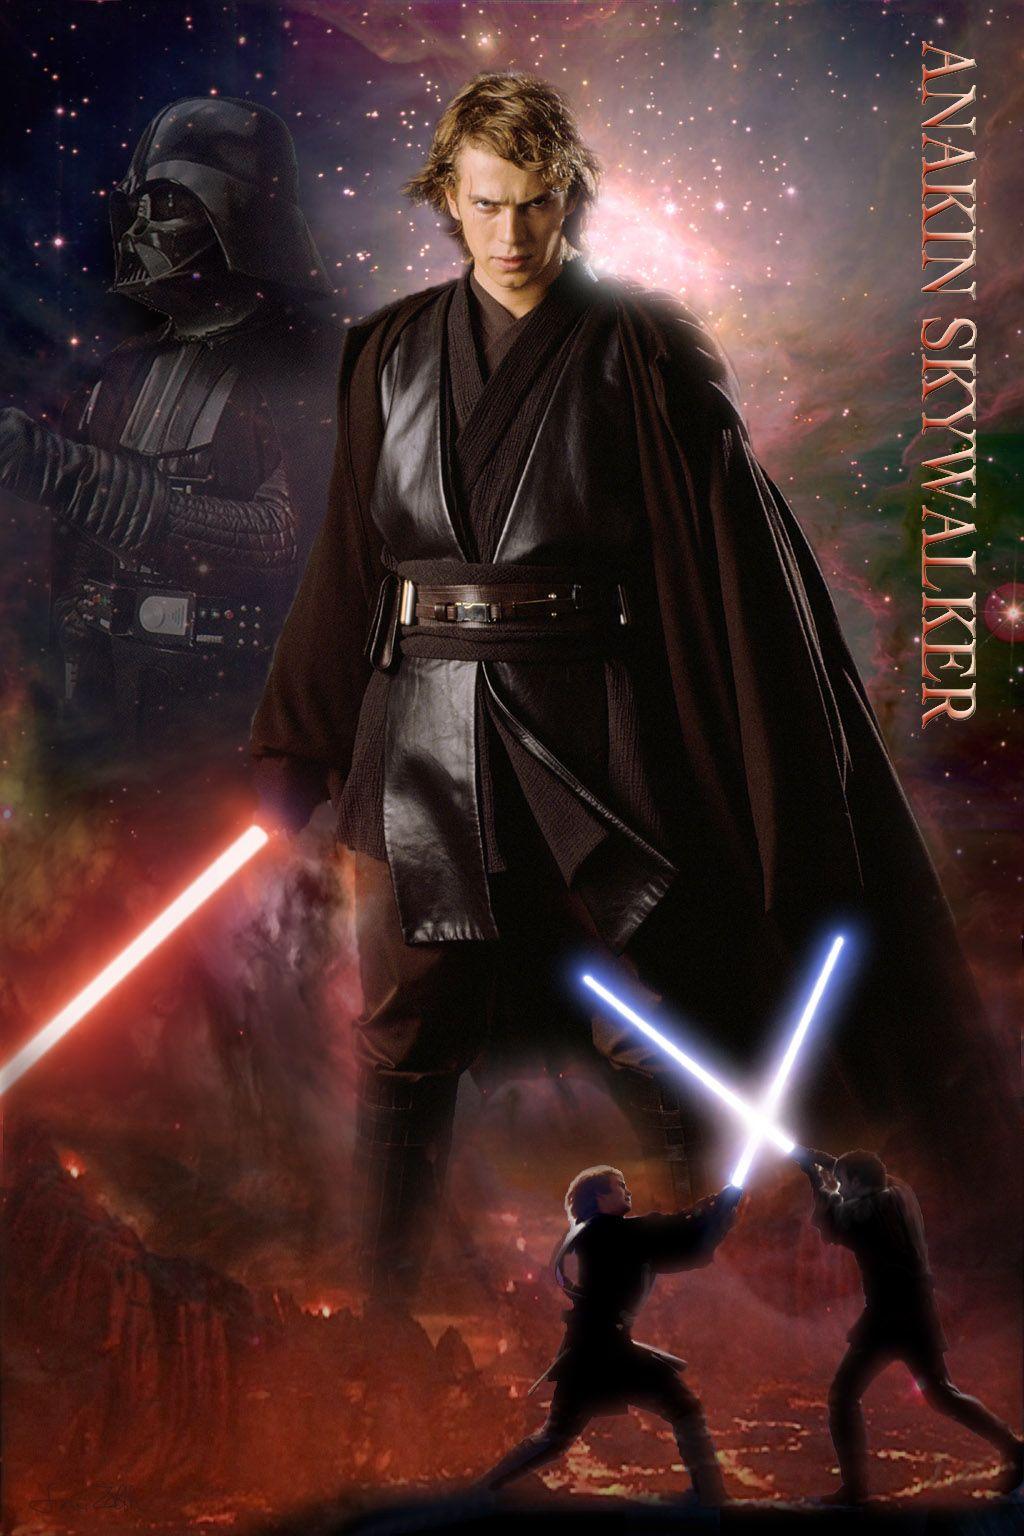 Anakin skywalker - Amazing Jedi Outfit